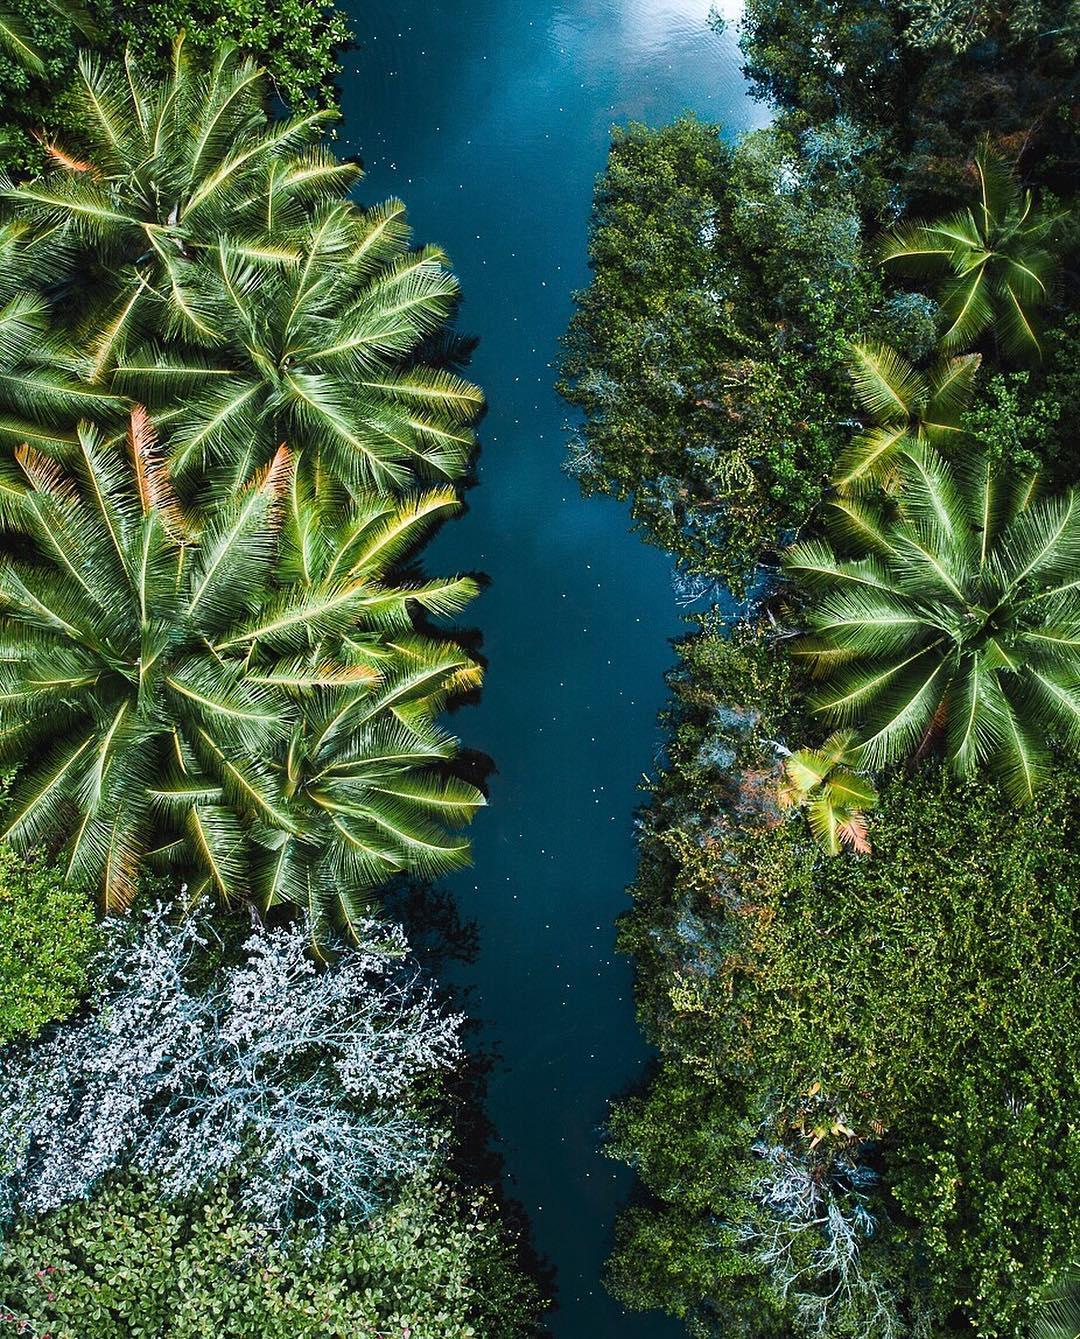 Tobias Hagg - Aerial Landscape Photographer